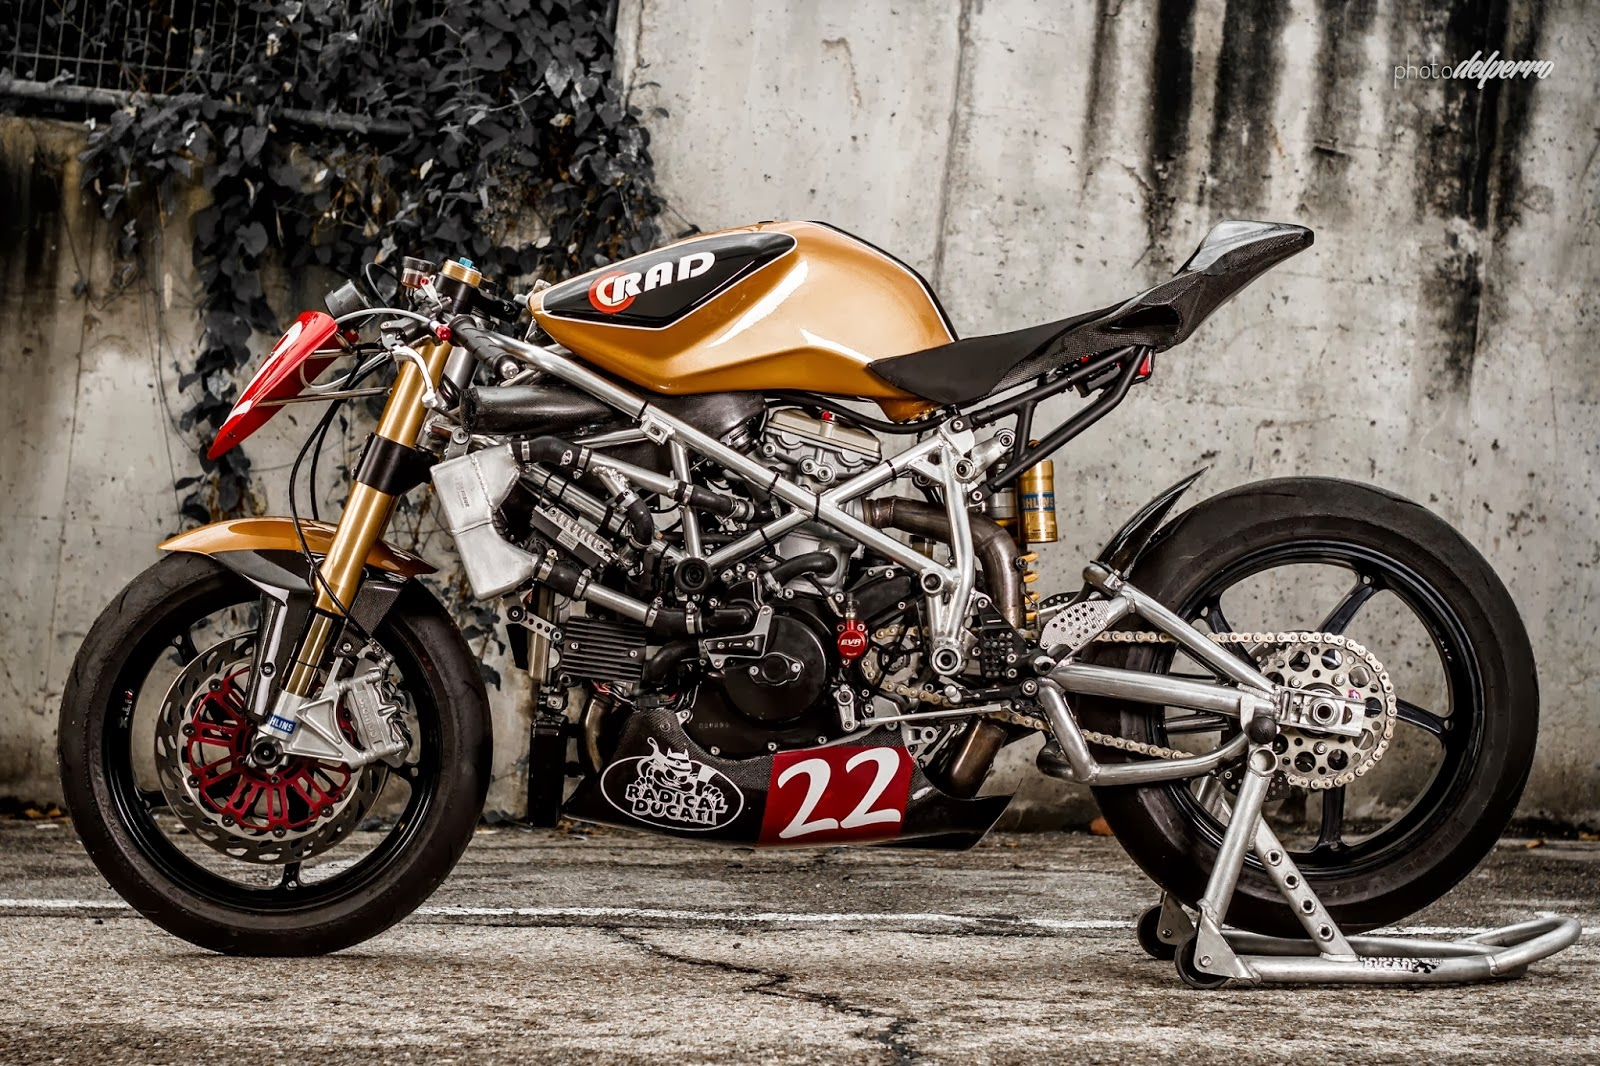 ducati 1198 matador racer return of the cafe racers. Black Bedroom Furniture Sets. Home Design Ideas